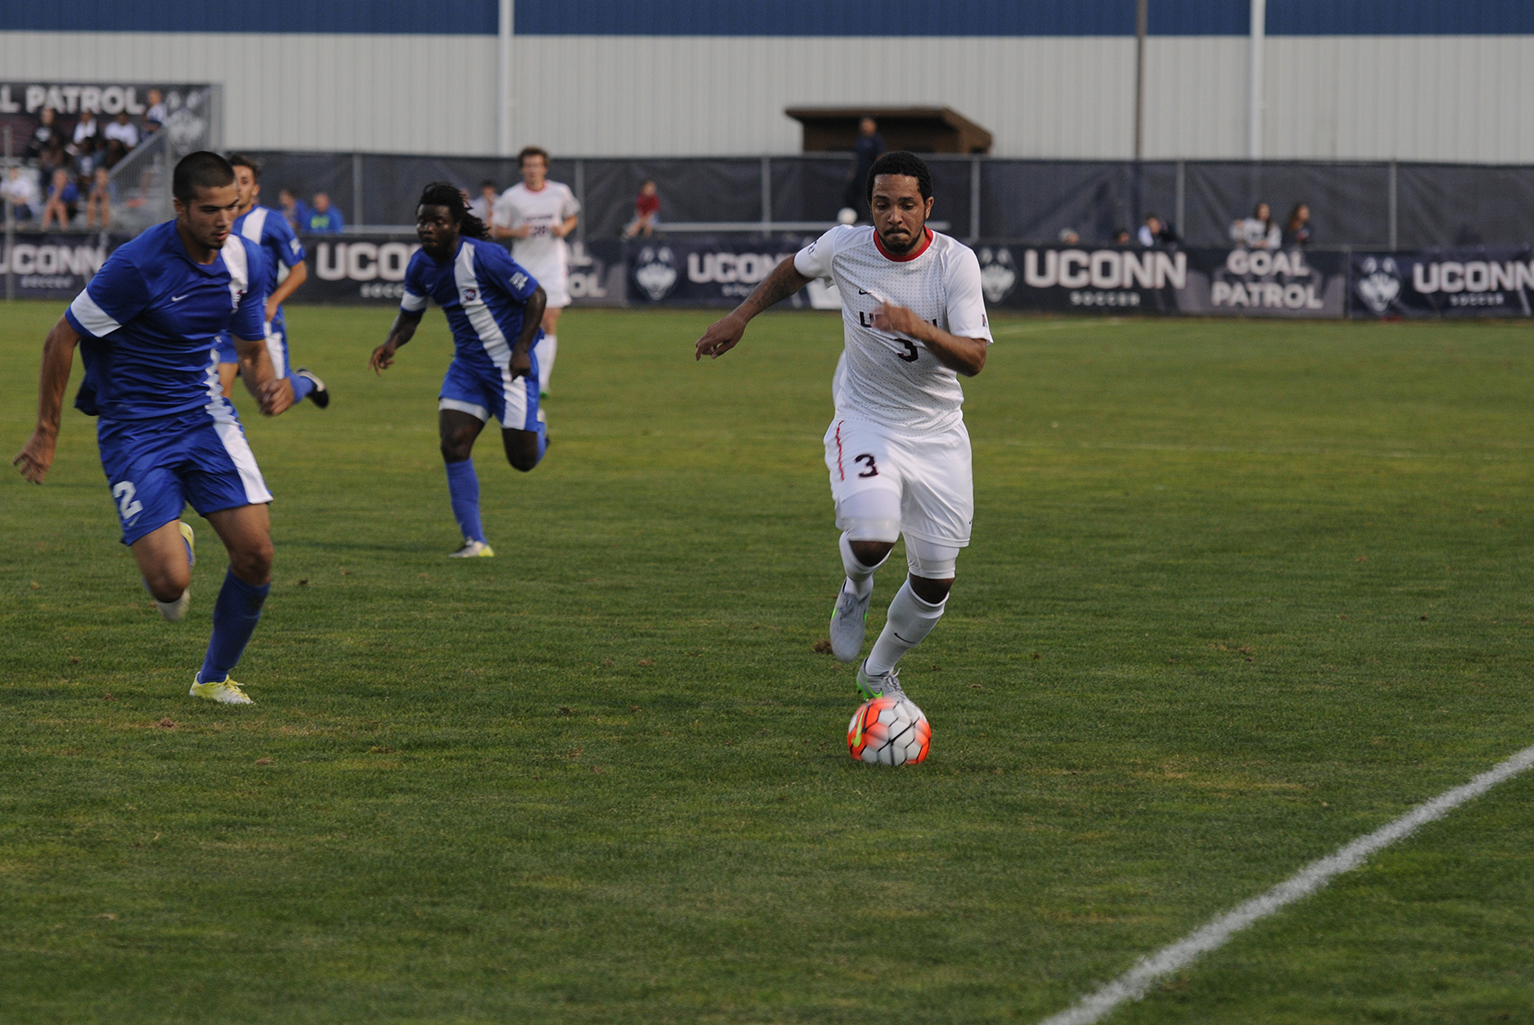 Men's Soccer: Huskies draw St  Francis College 0-0 in season